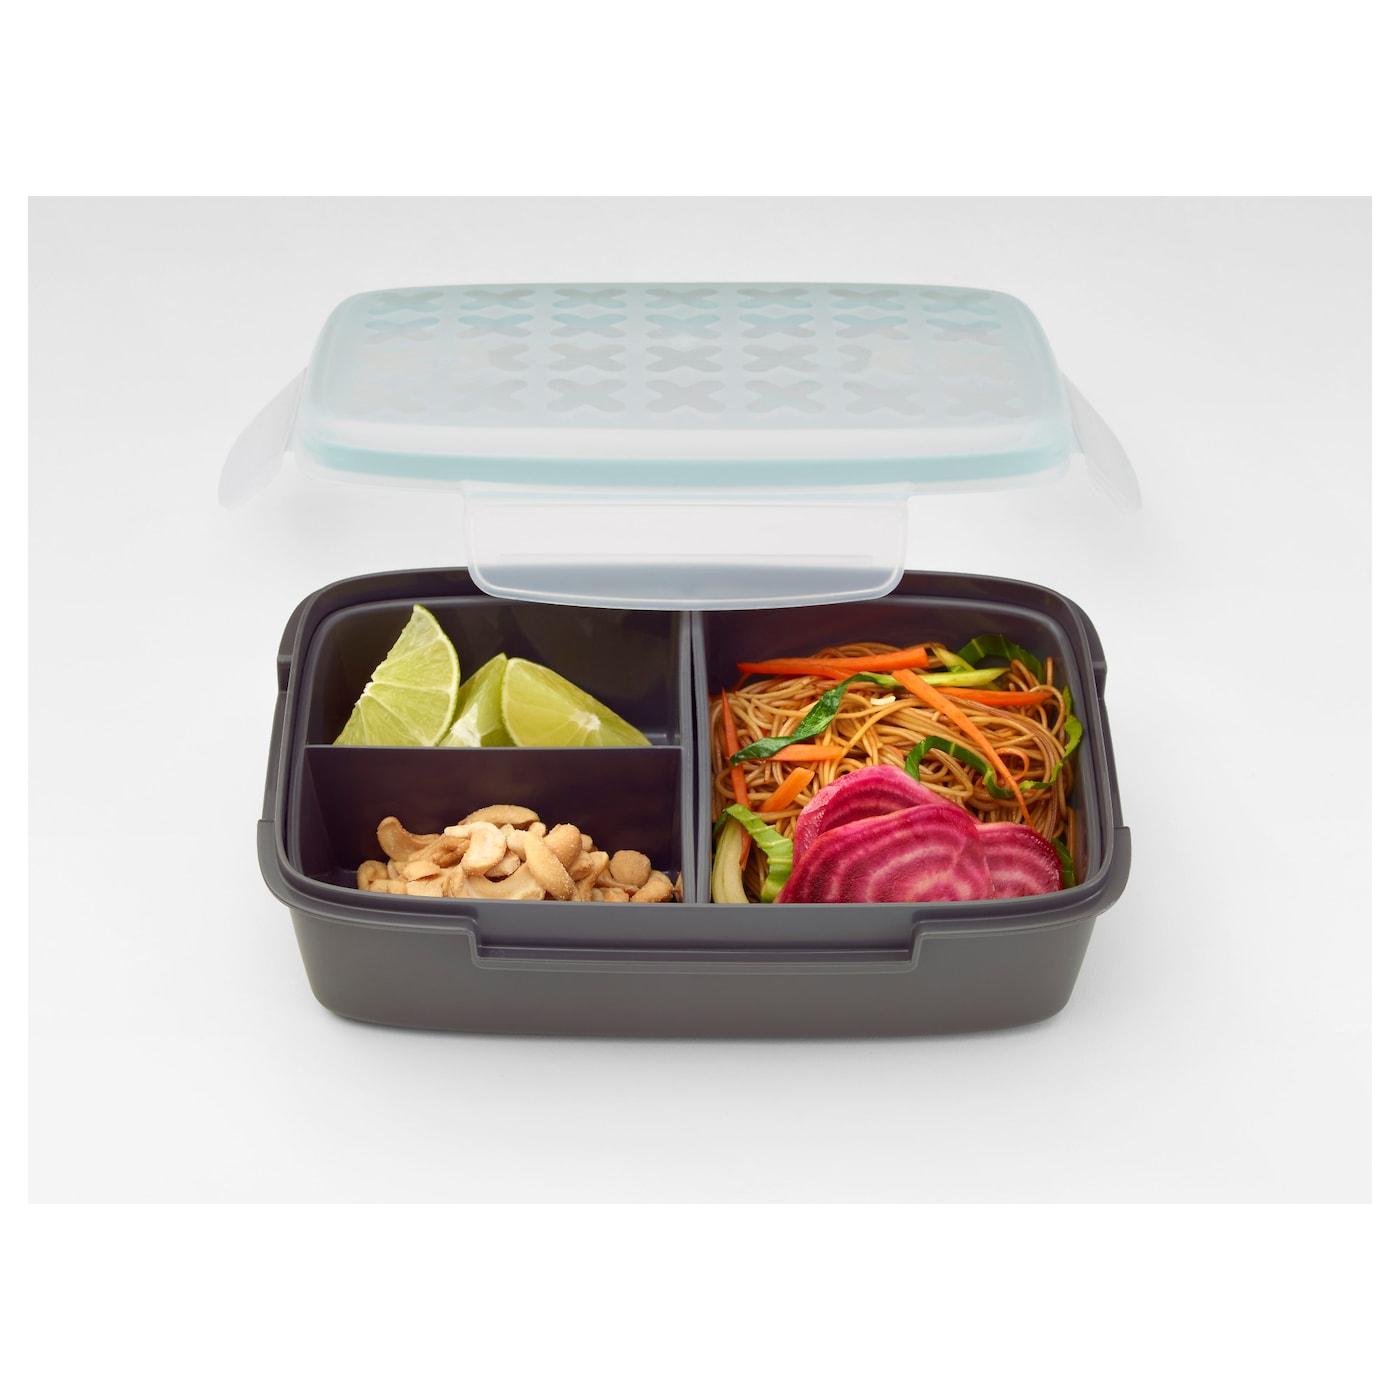 festm ltid lunch box grey 22 x 14 x 7 cm ikea. Black Bedroom Furniture Sets. Home Design Ideas